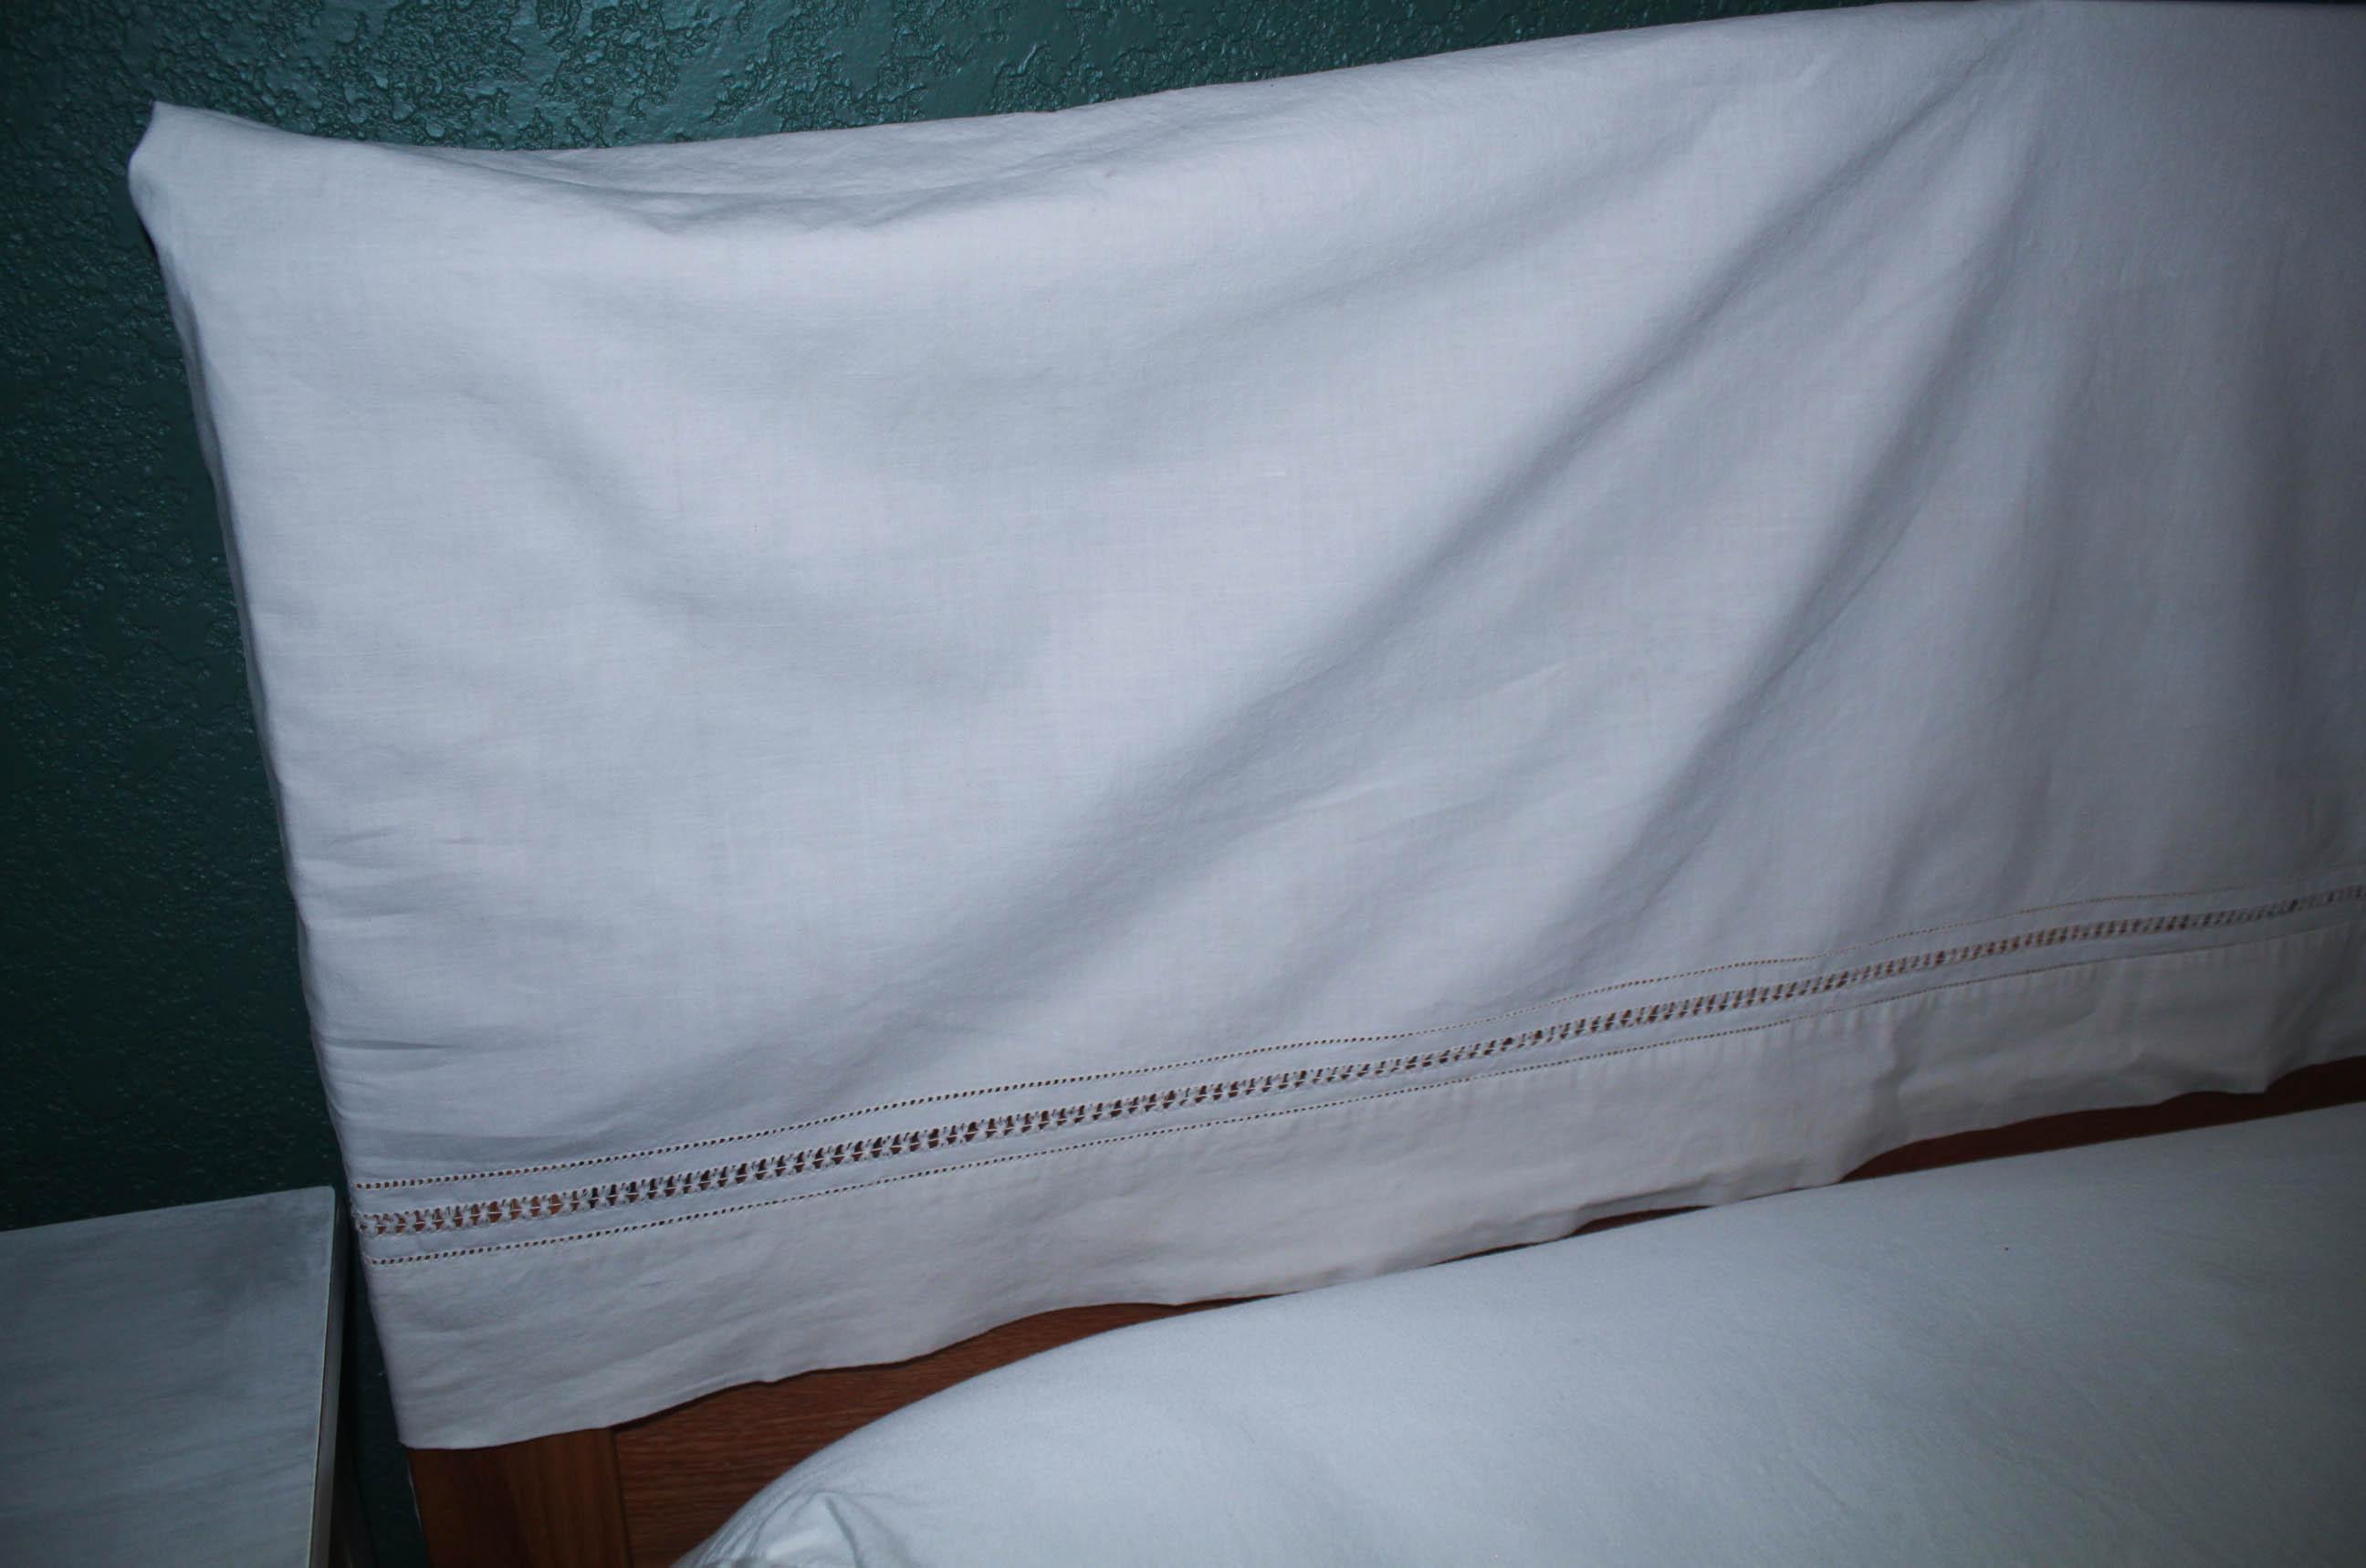 Slipcovers - Hiding a Wood Headboard